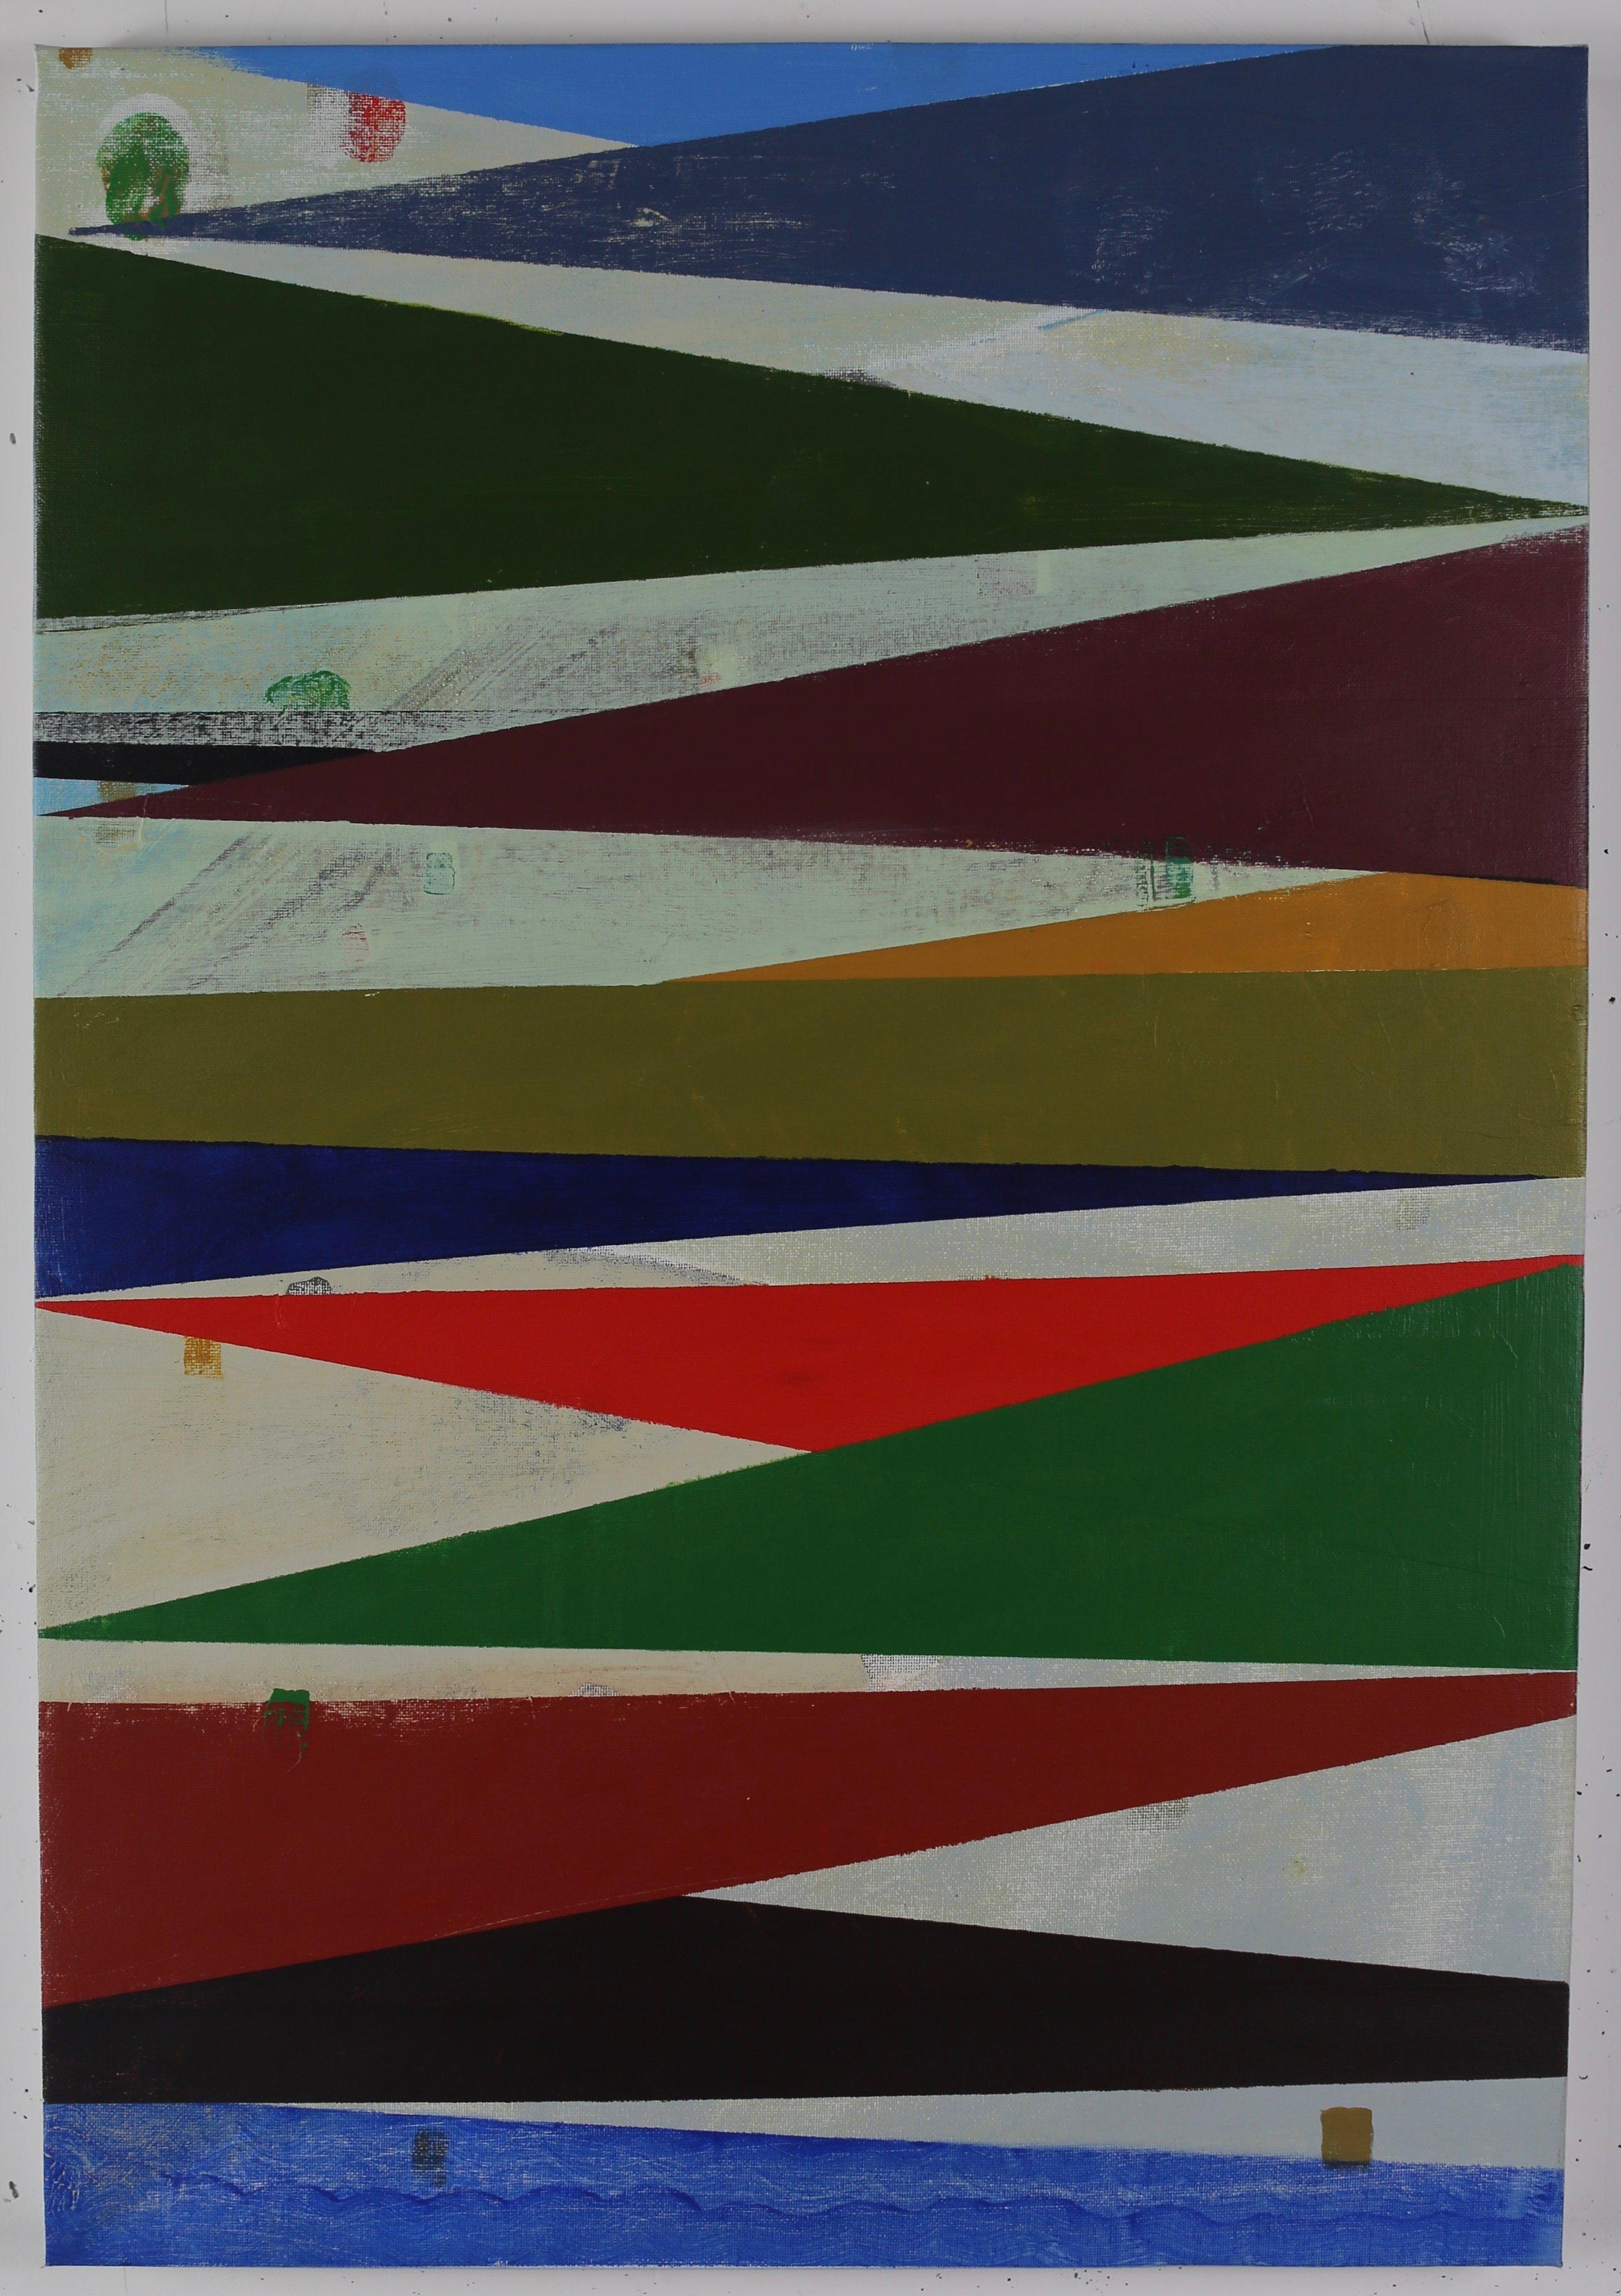 8-Bit Radiant,2018, acrylic on canvas 71x49cm